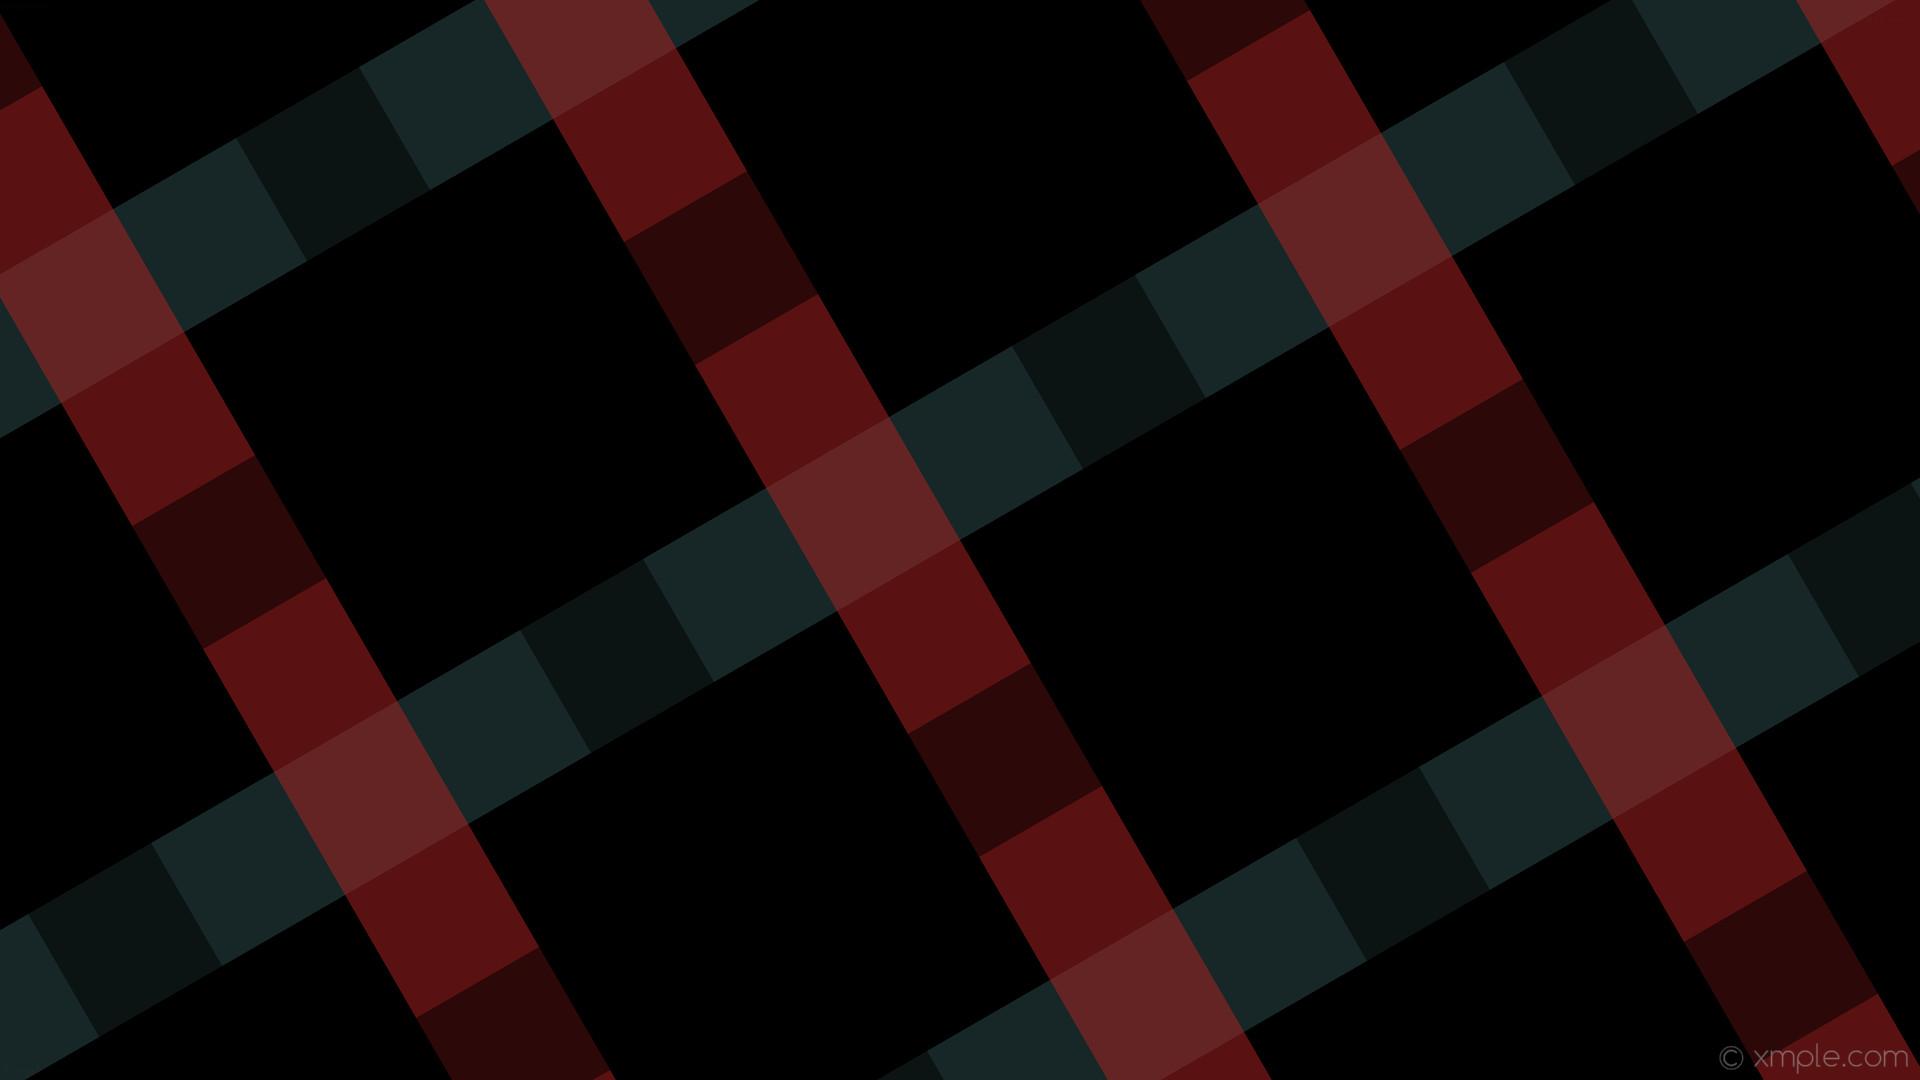 wallpaper quad gingham black striped grey red dark slate gray fire brick  #000000 #2f4f4f